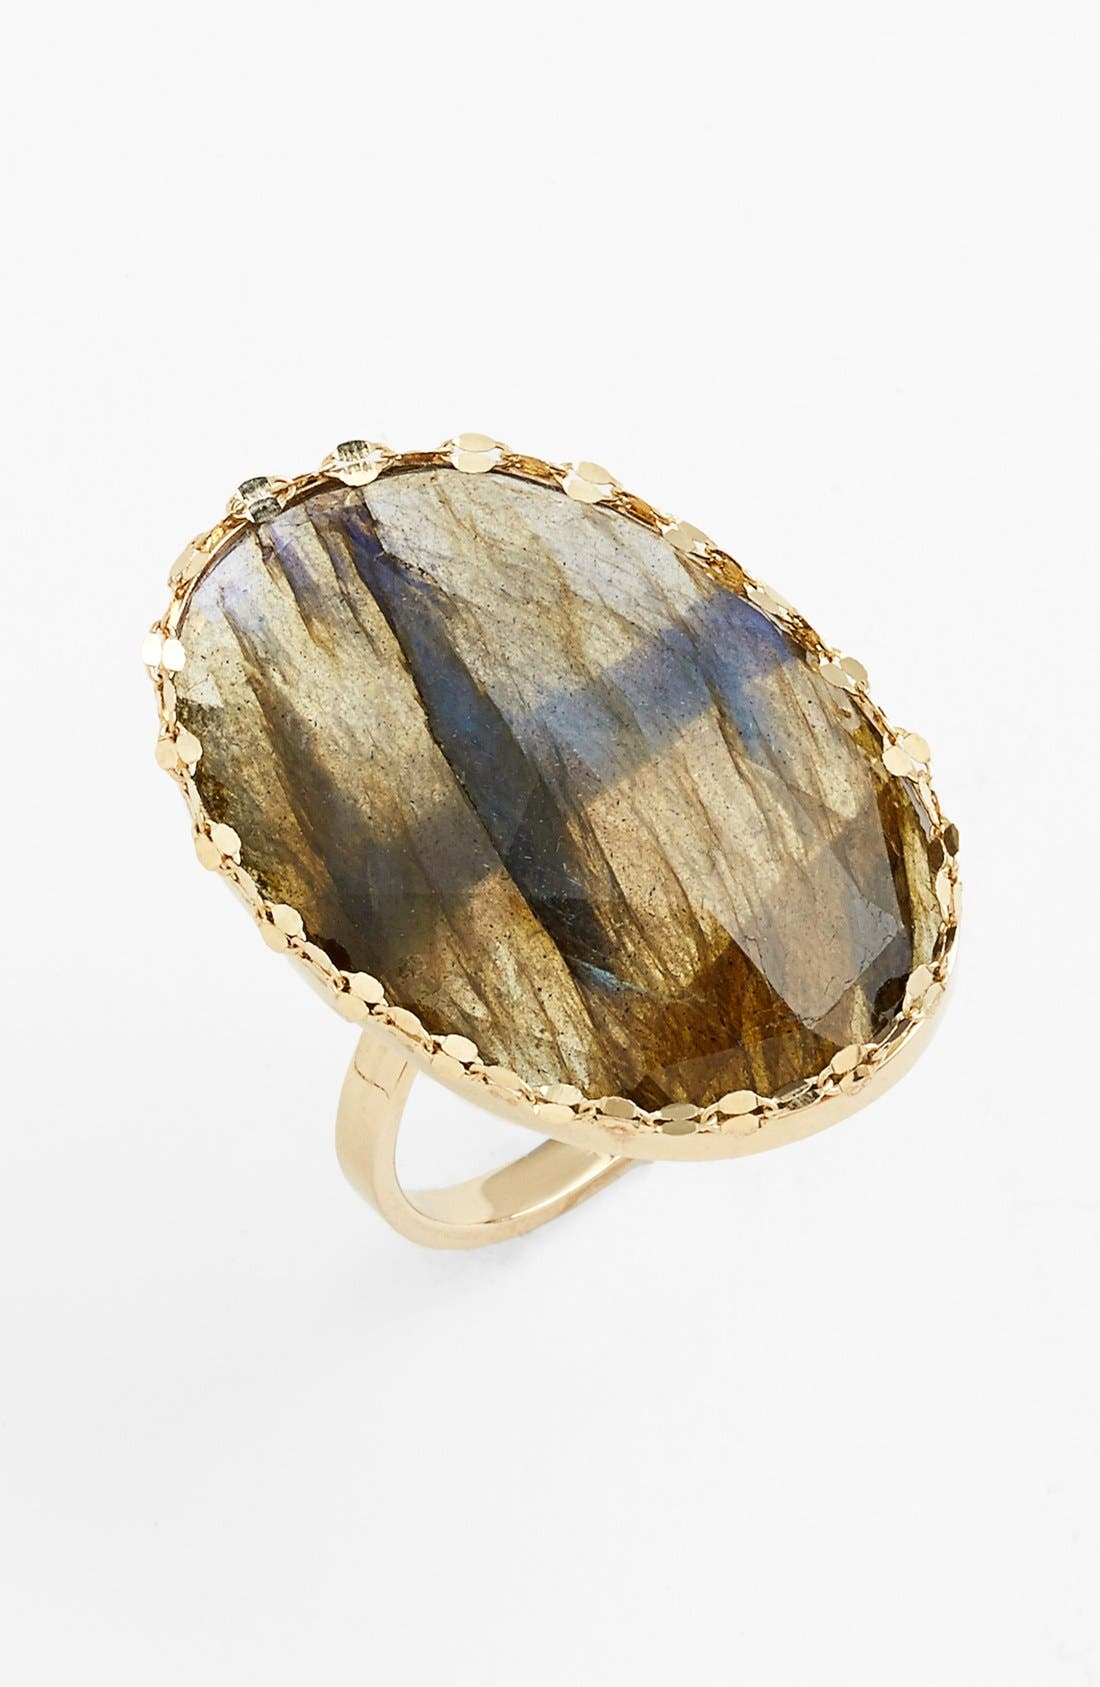 Alternate Image 1 Selected - Lana Jewelry 'Ultra' Small Labradorite Ring